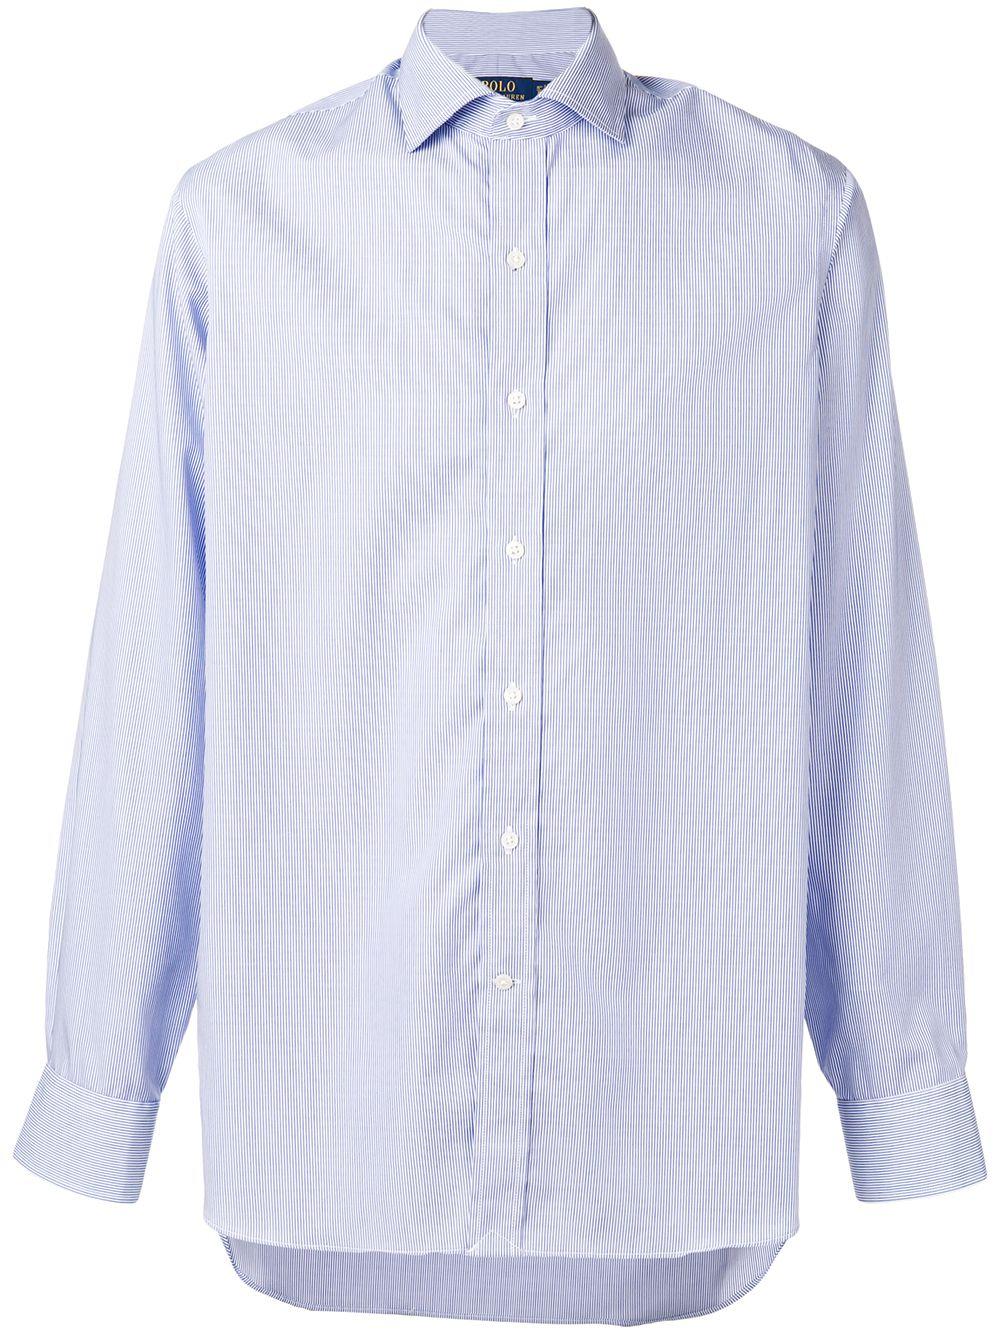 Polo Ralph Lauren classic longsleeved shirt - Blue - Glami.sk ac12c7c8828